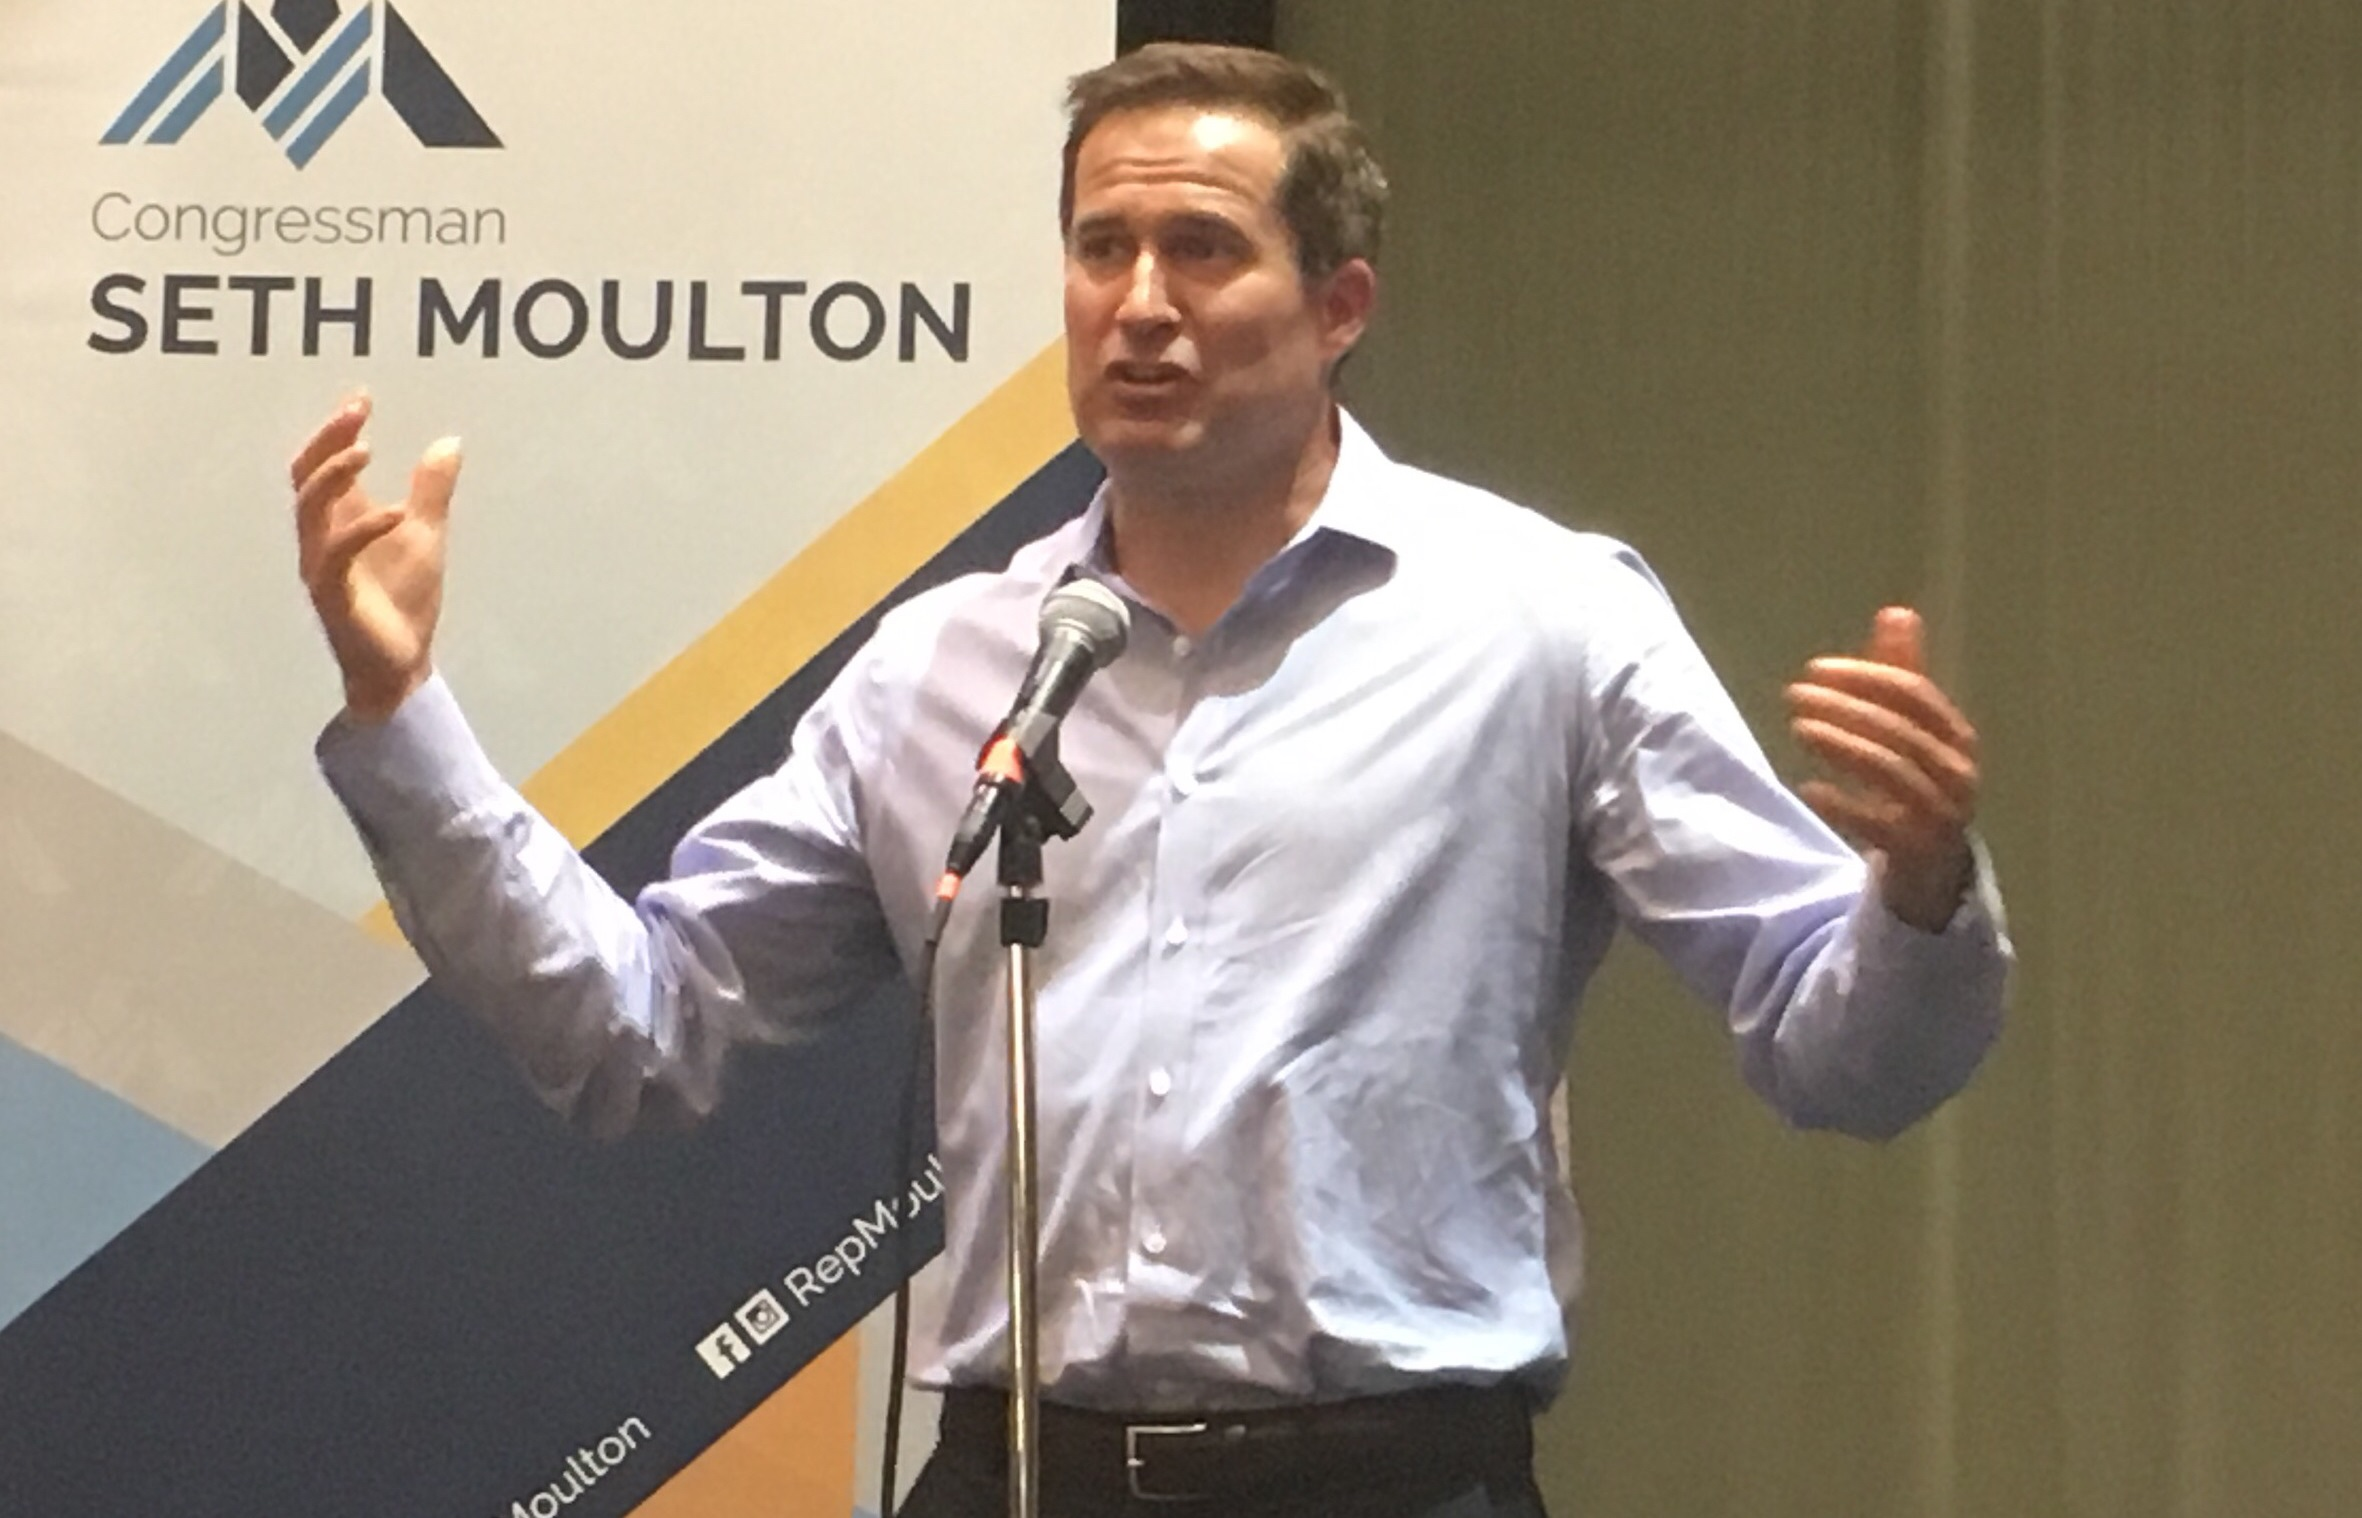 U.S. Rep. Seth Moulton spoke at a town hall event